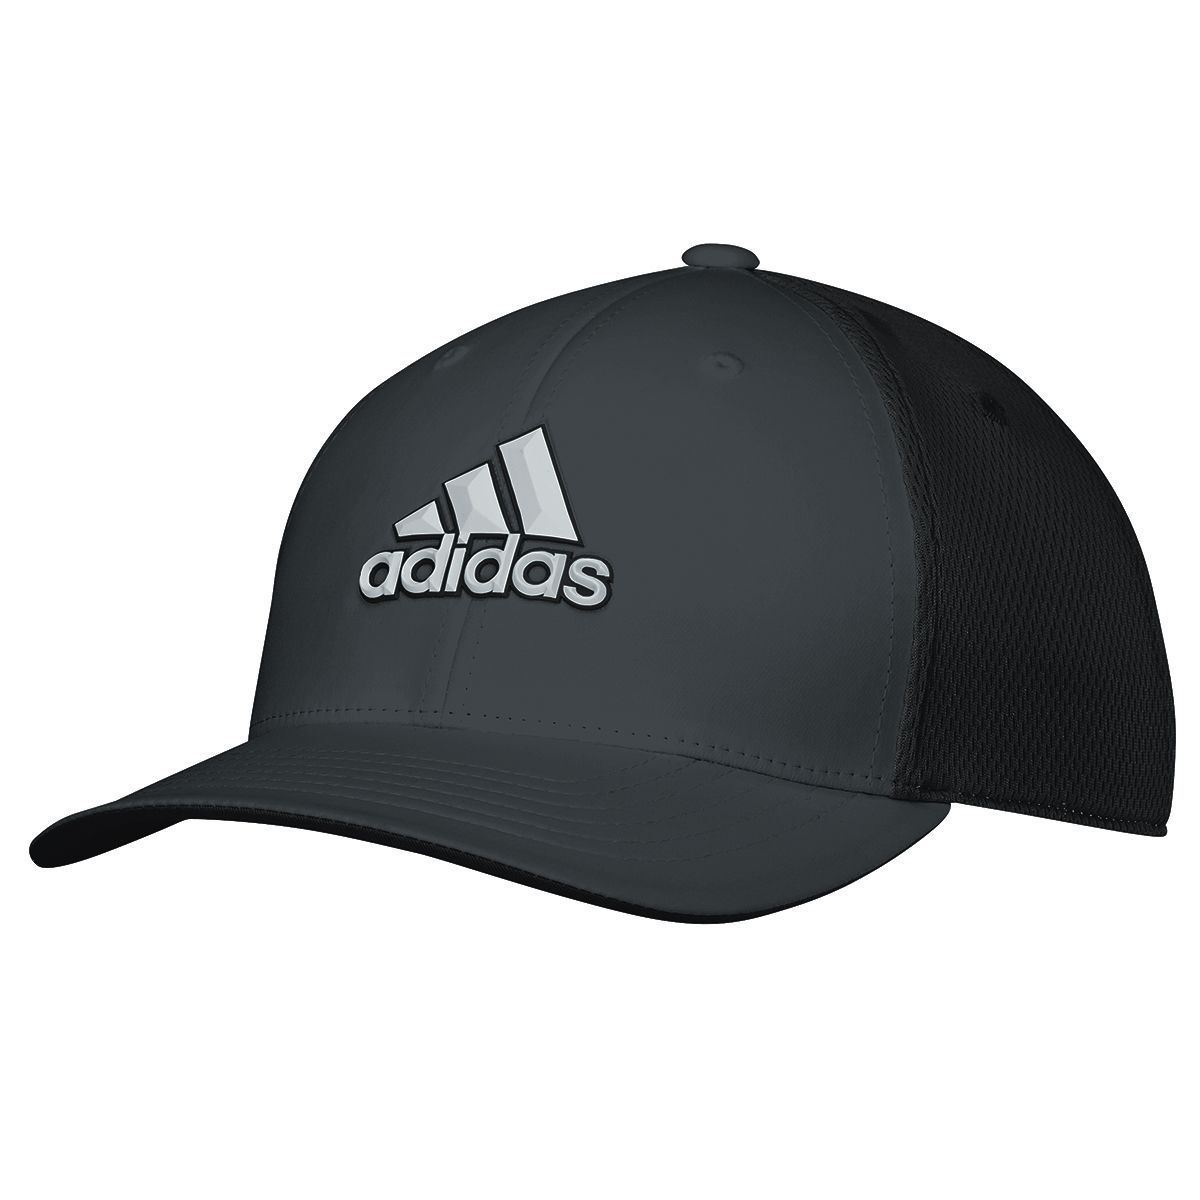 677eb48b Adidas Tour Stretch Cap CF3186 - Next Day Delivery Golf Equipment